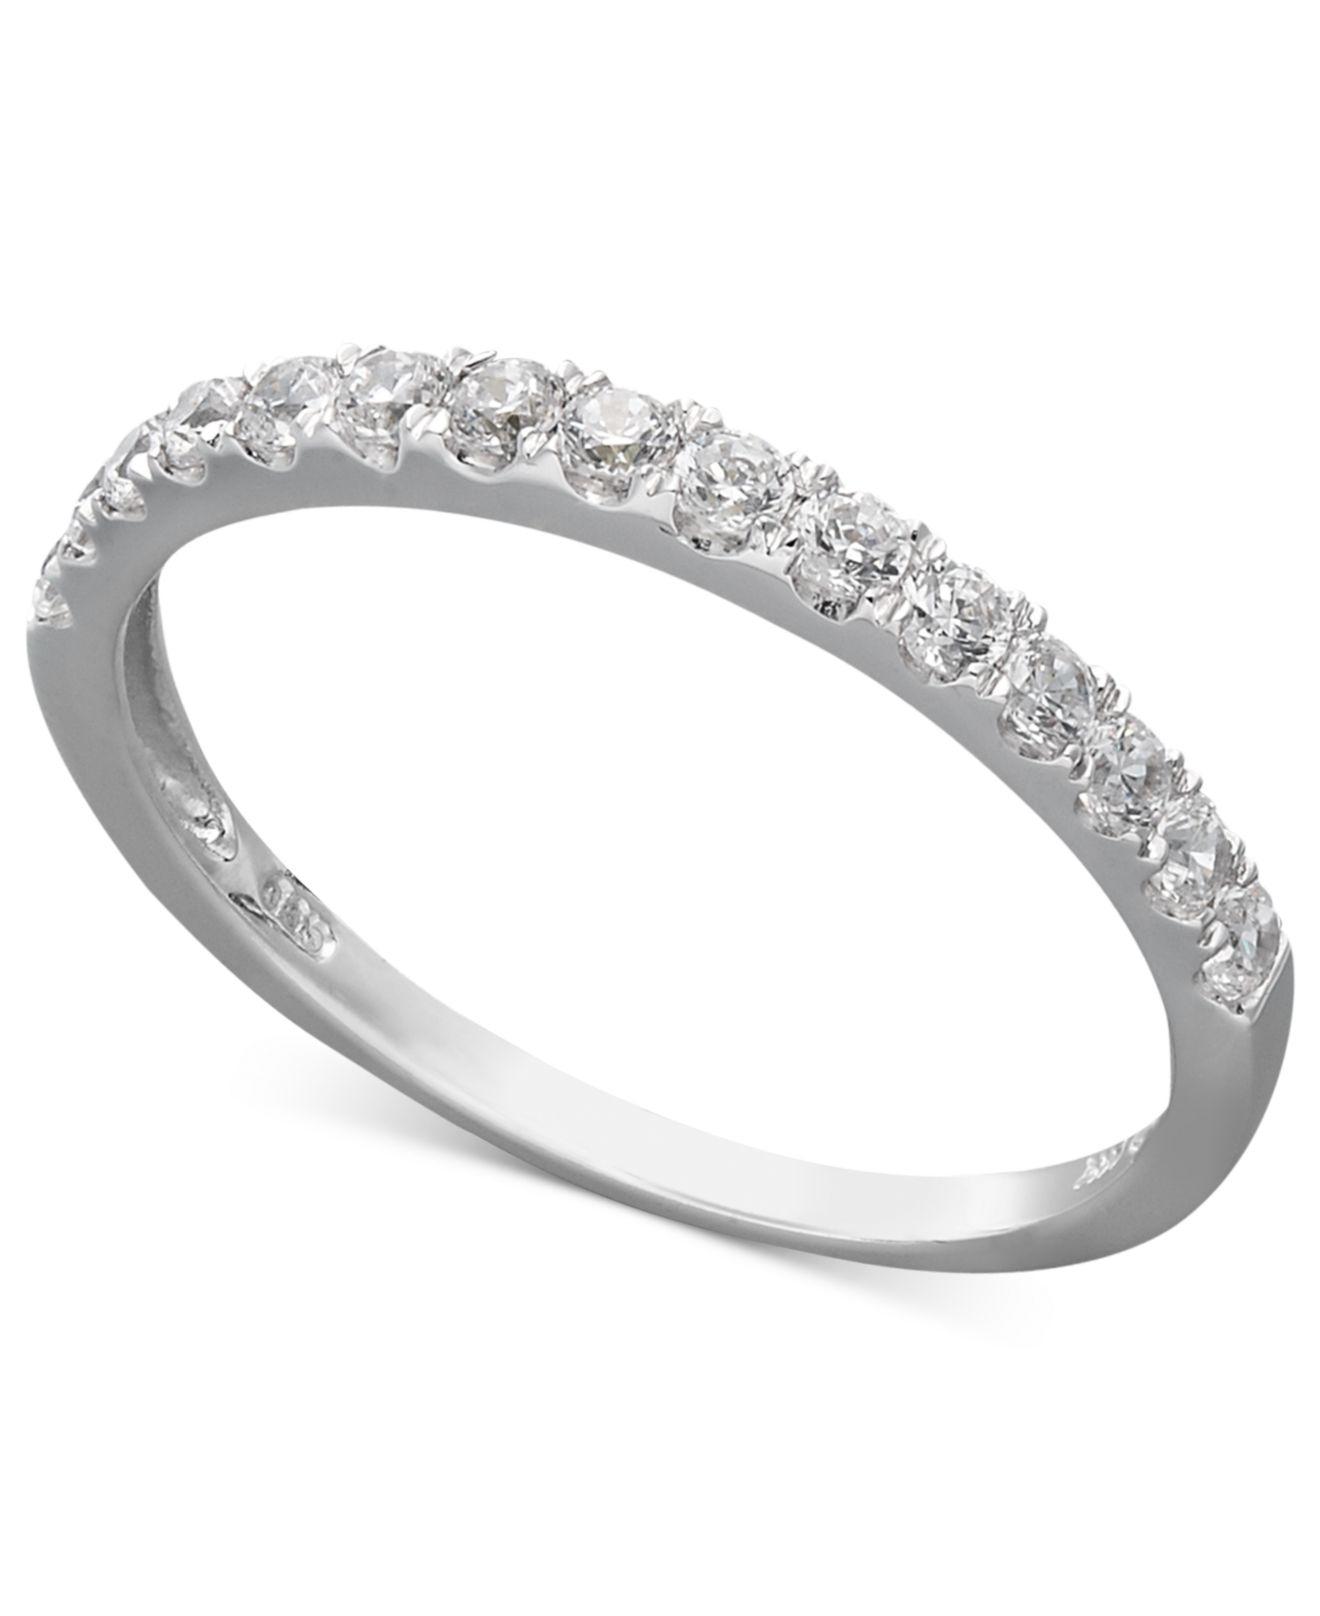 Swarovski Engagement Rings Macy